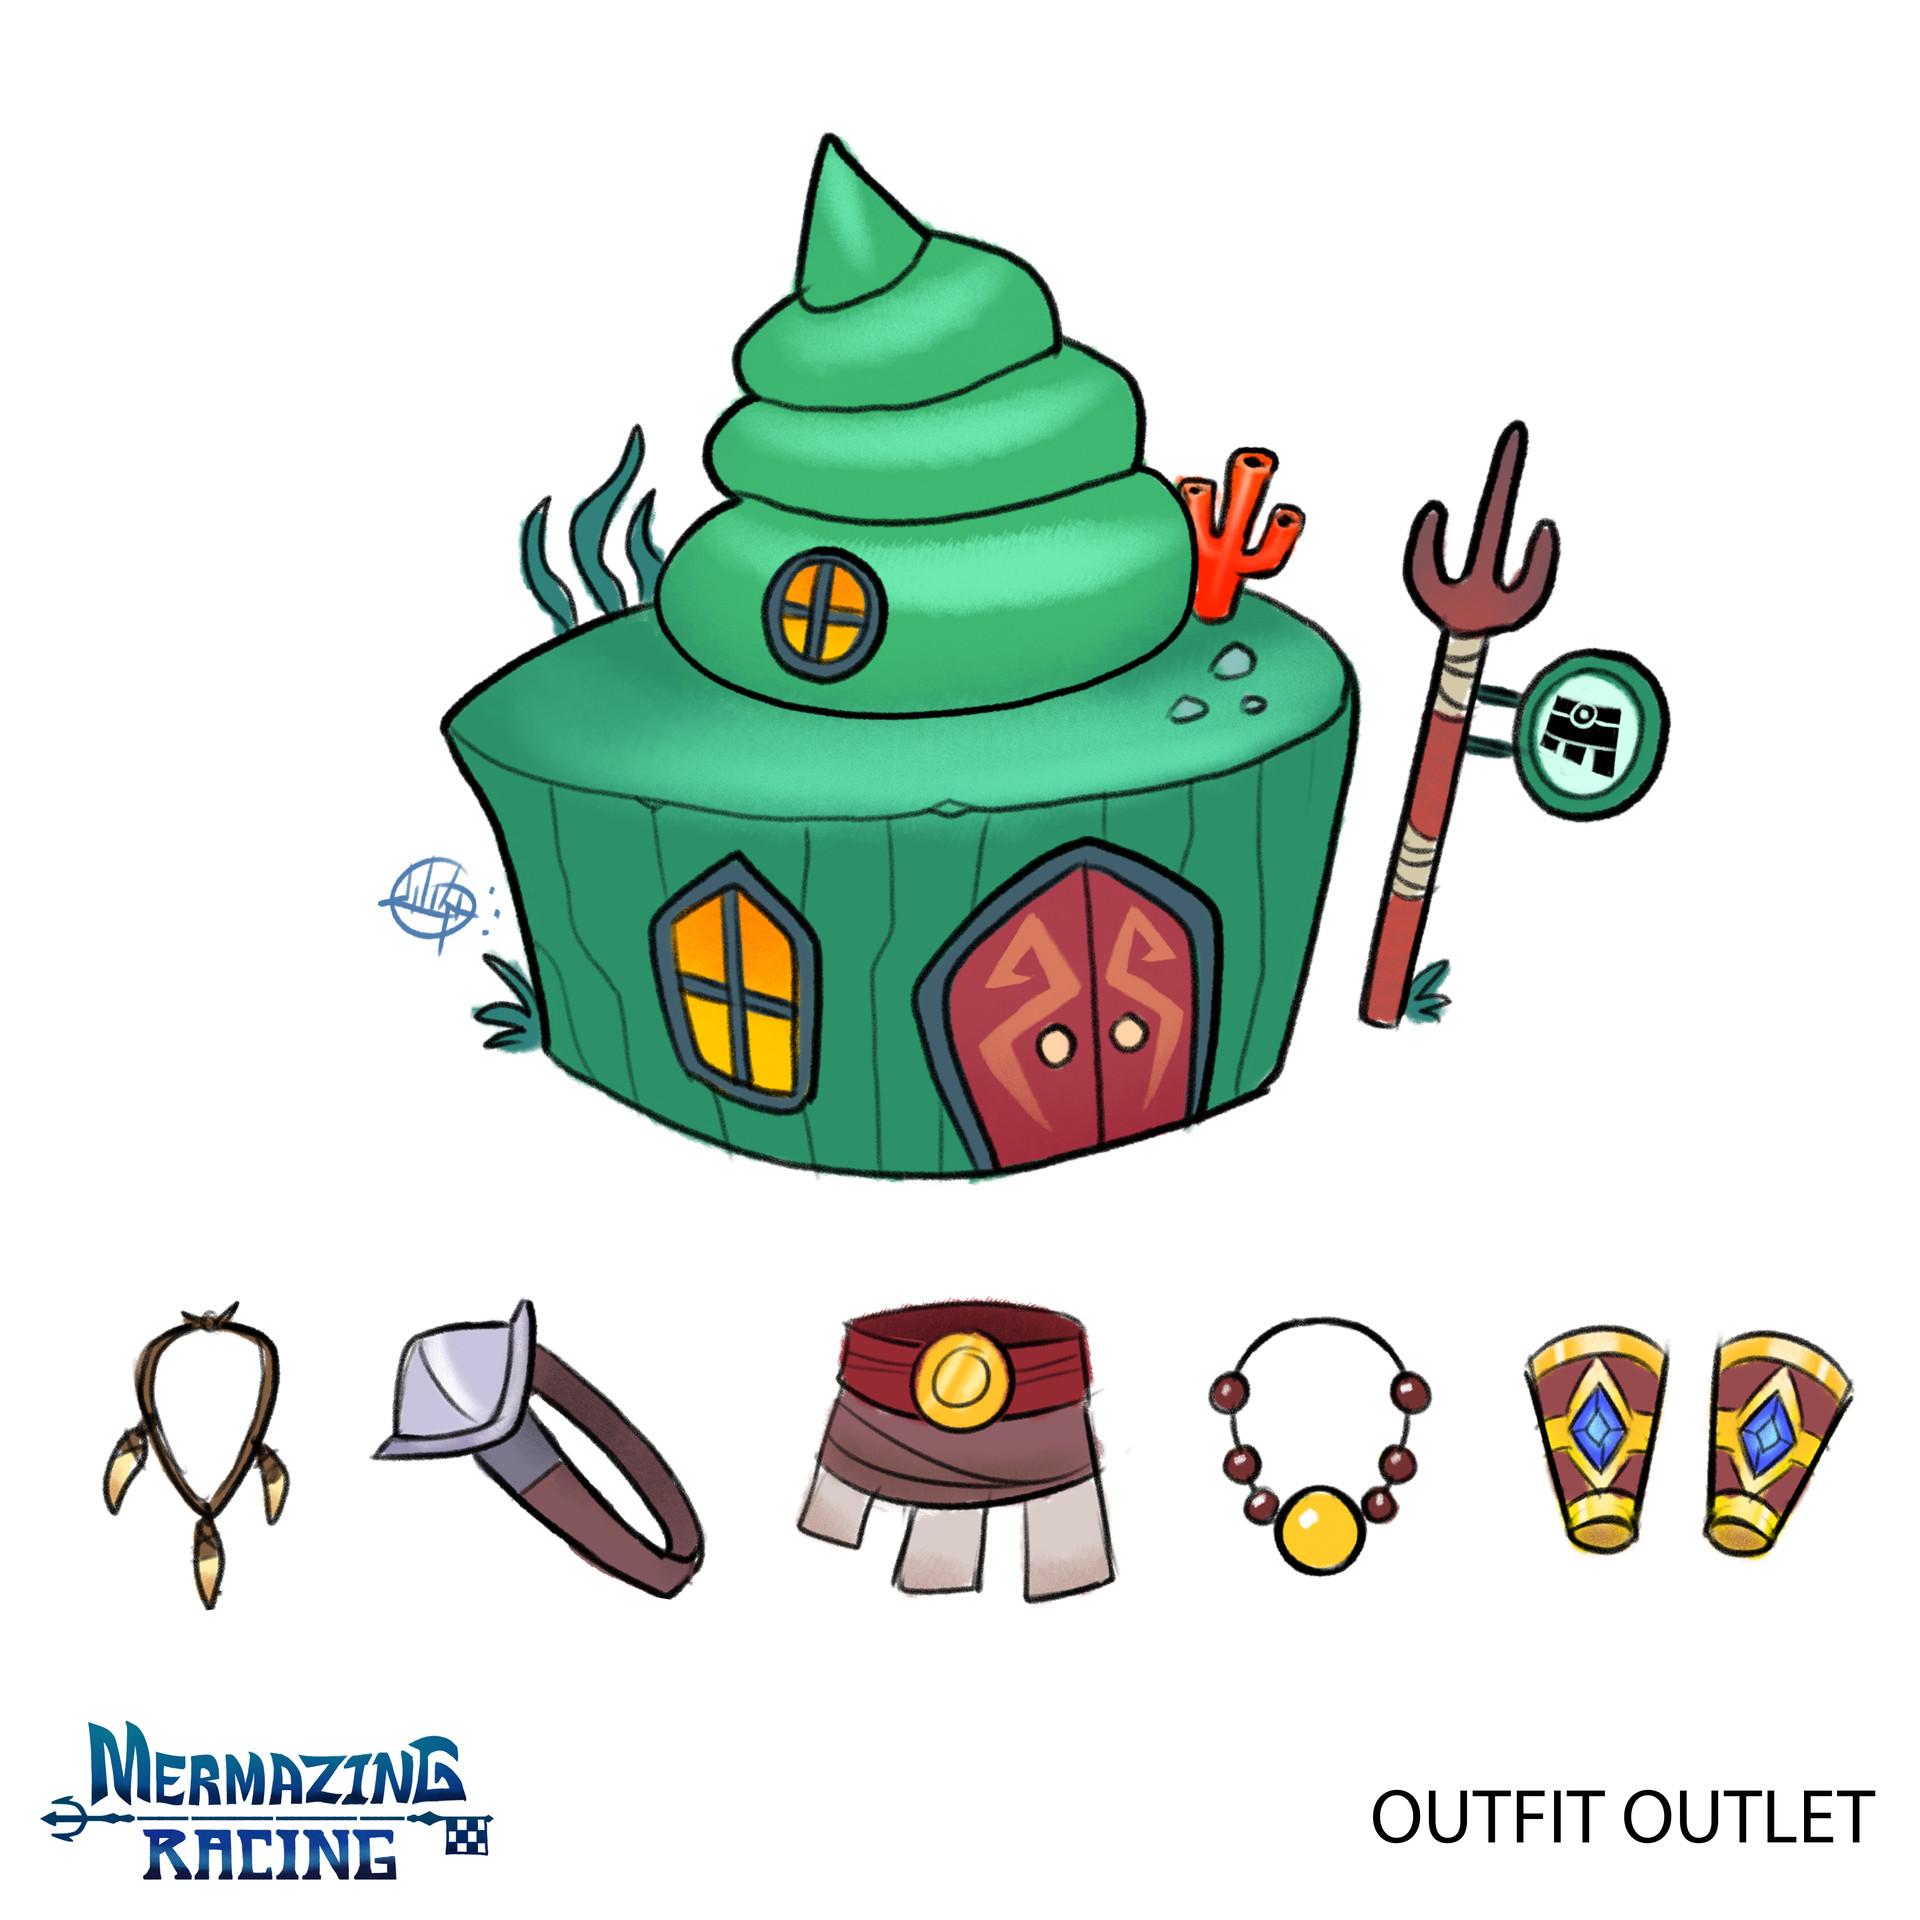 Luigi lucarelli outfit outlet